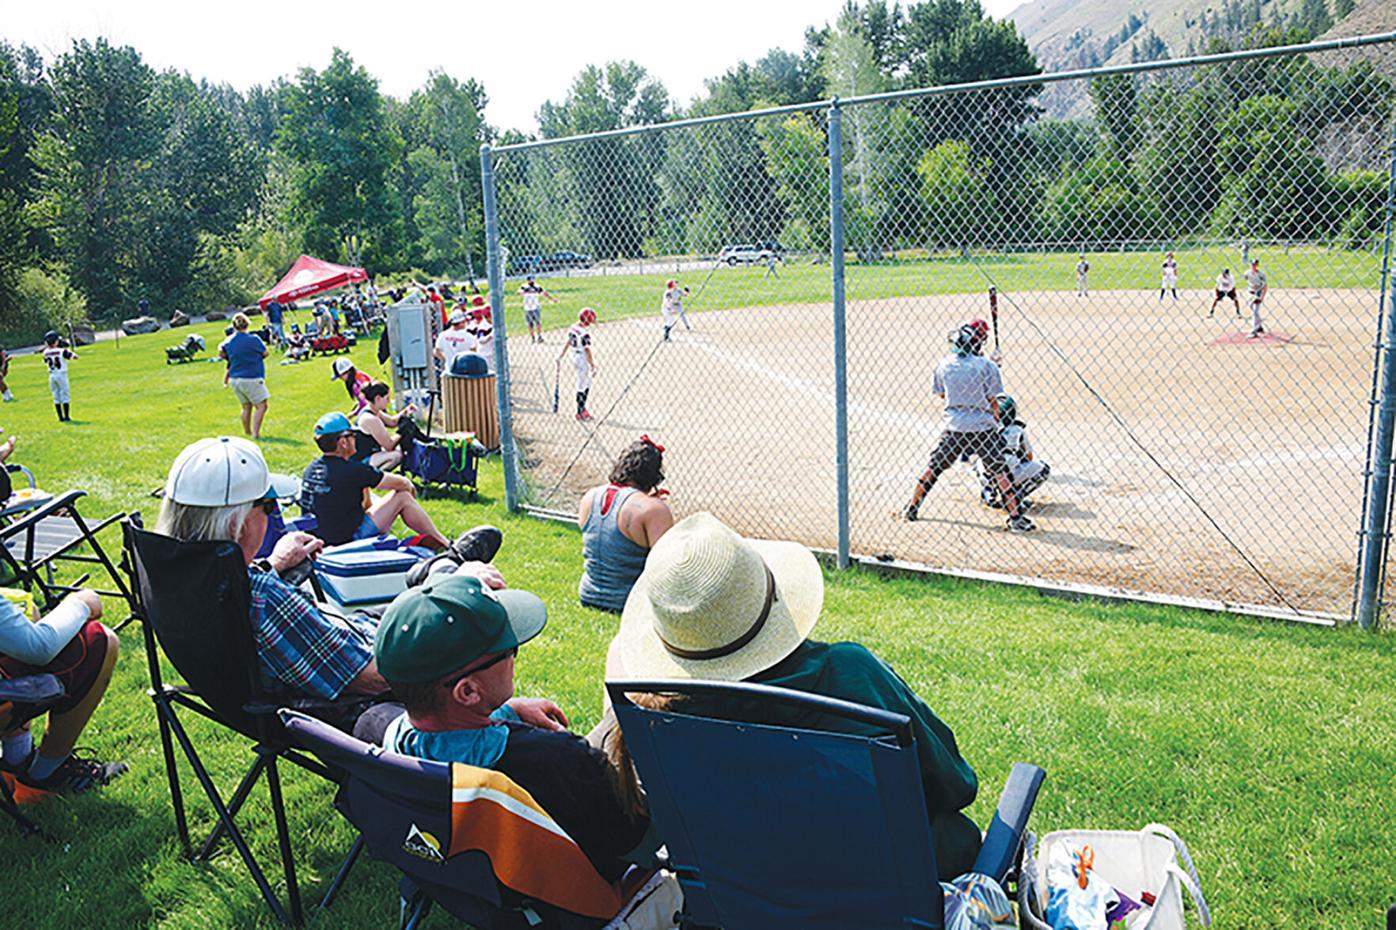 21-07-21 Ray Nelson Baseball Tournament 24 Roland.jpg